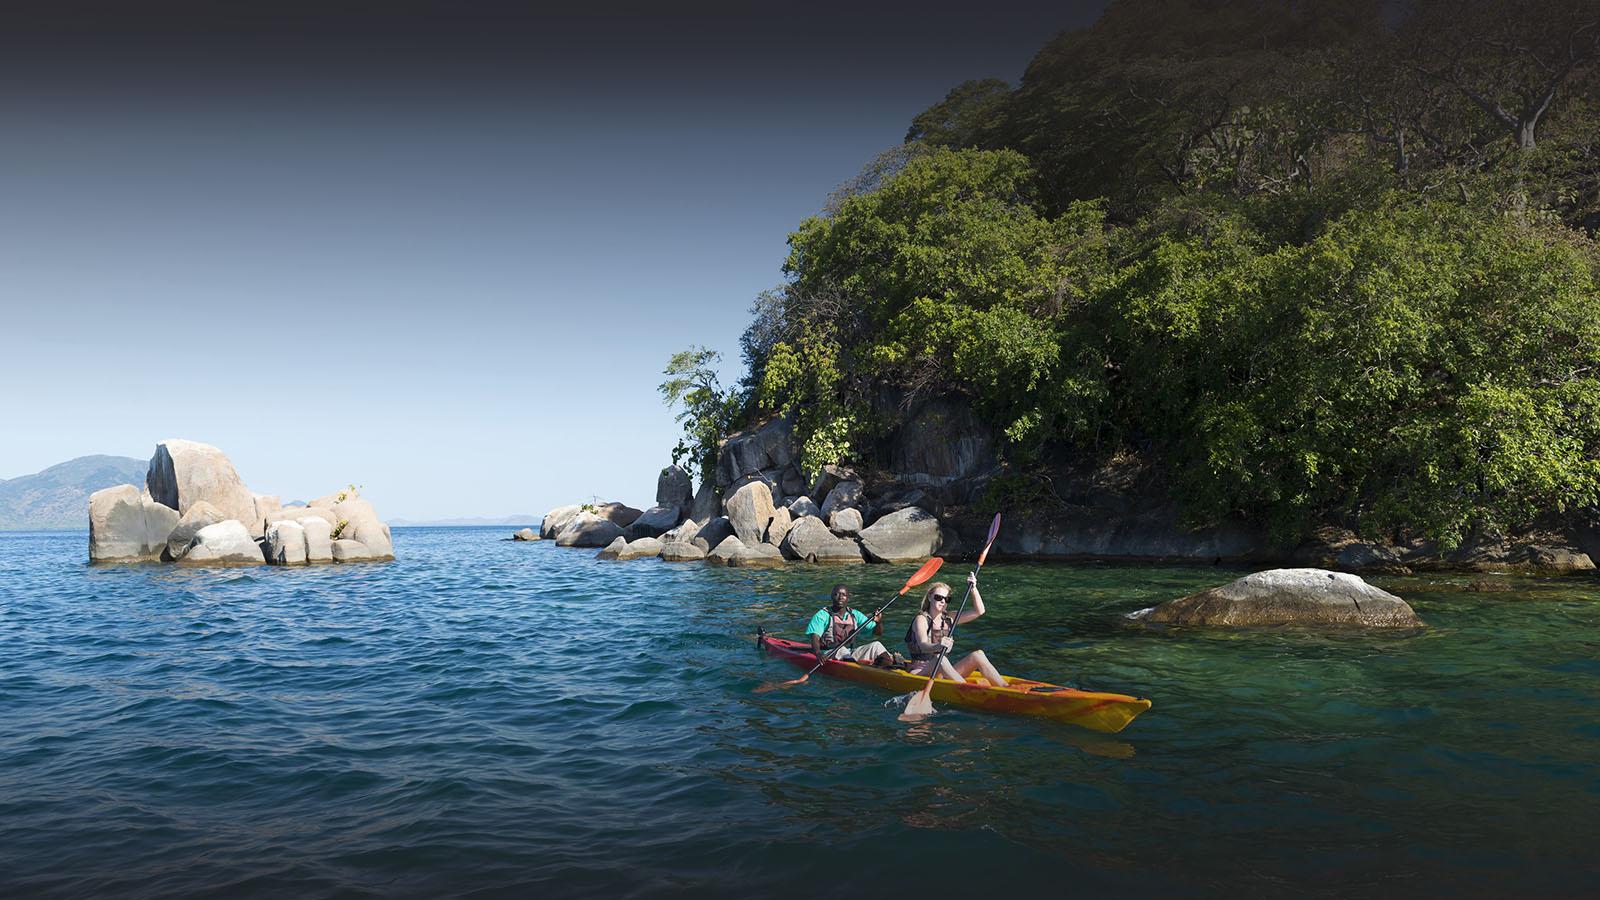 malawi-south-luangwa-green-season-zambia-in-style-safari-packages-tours-luxury-mumbo-kayak